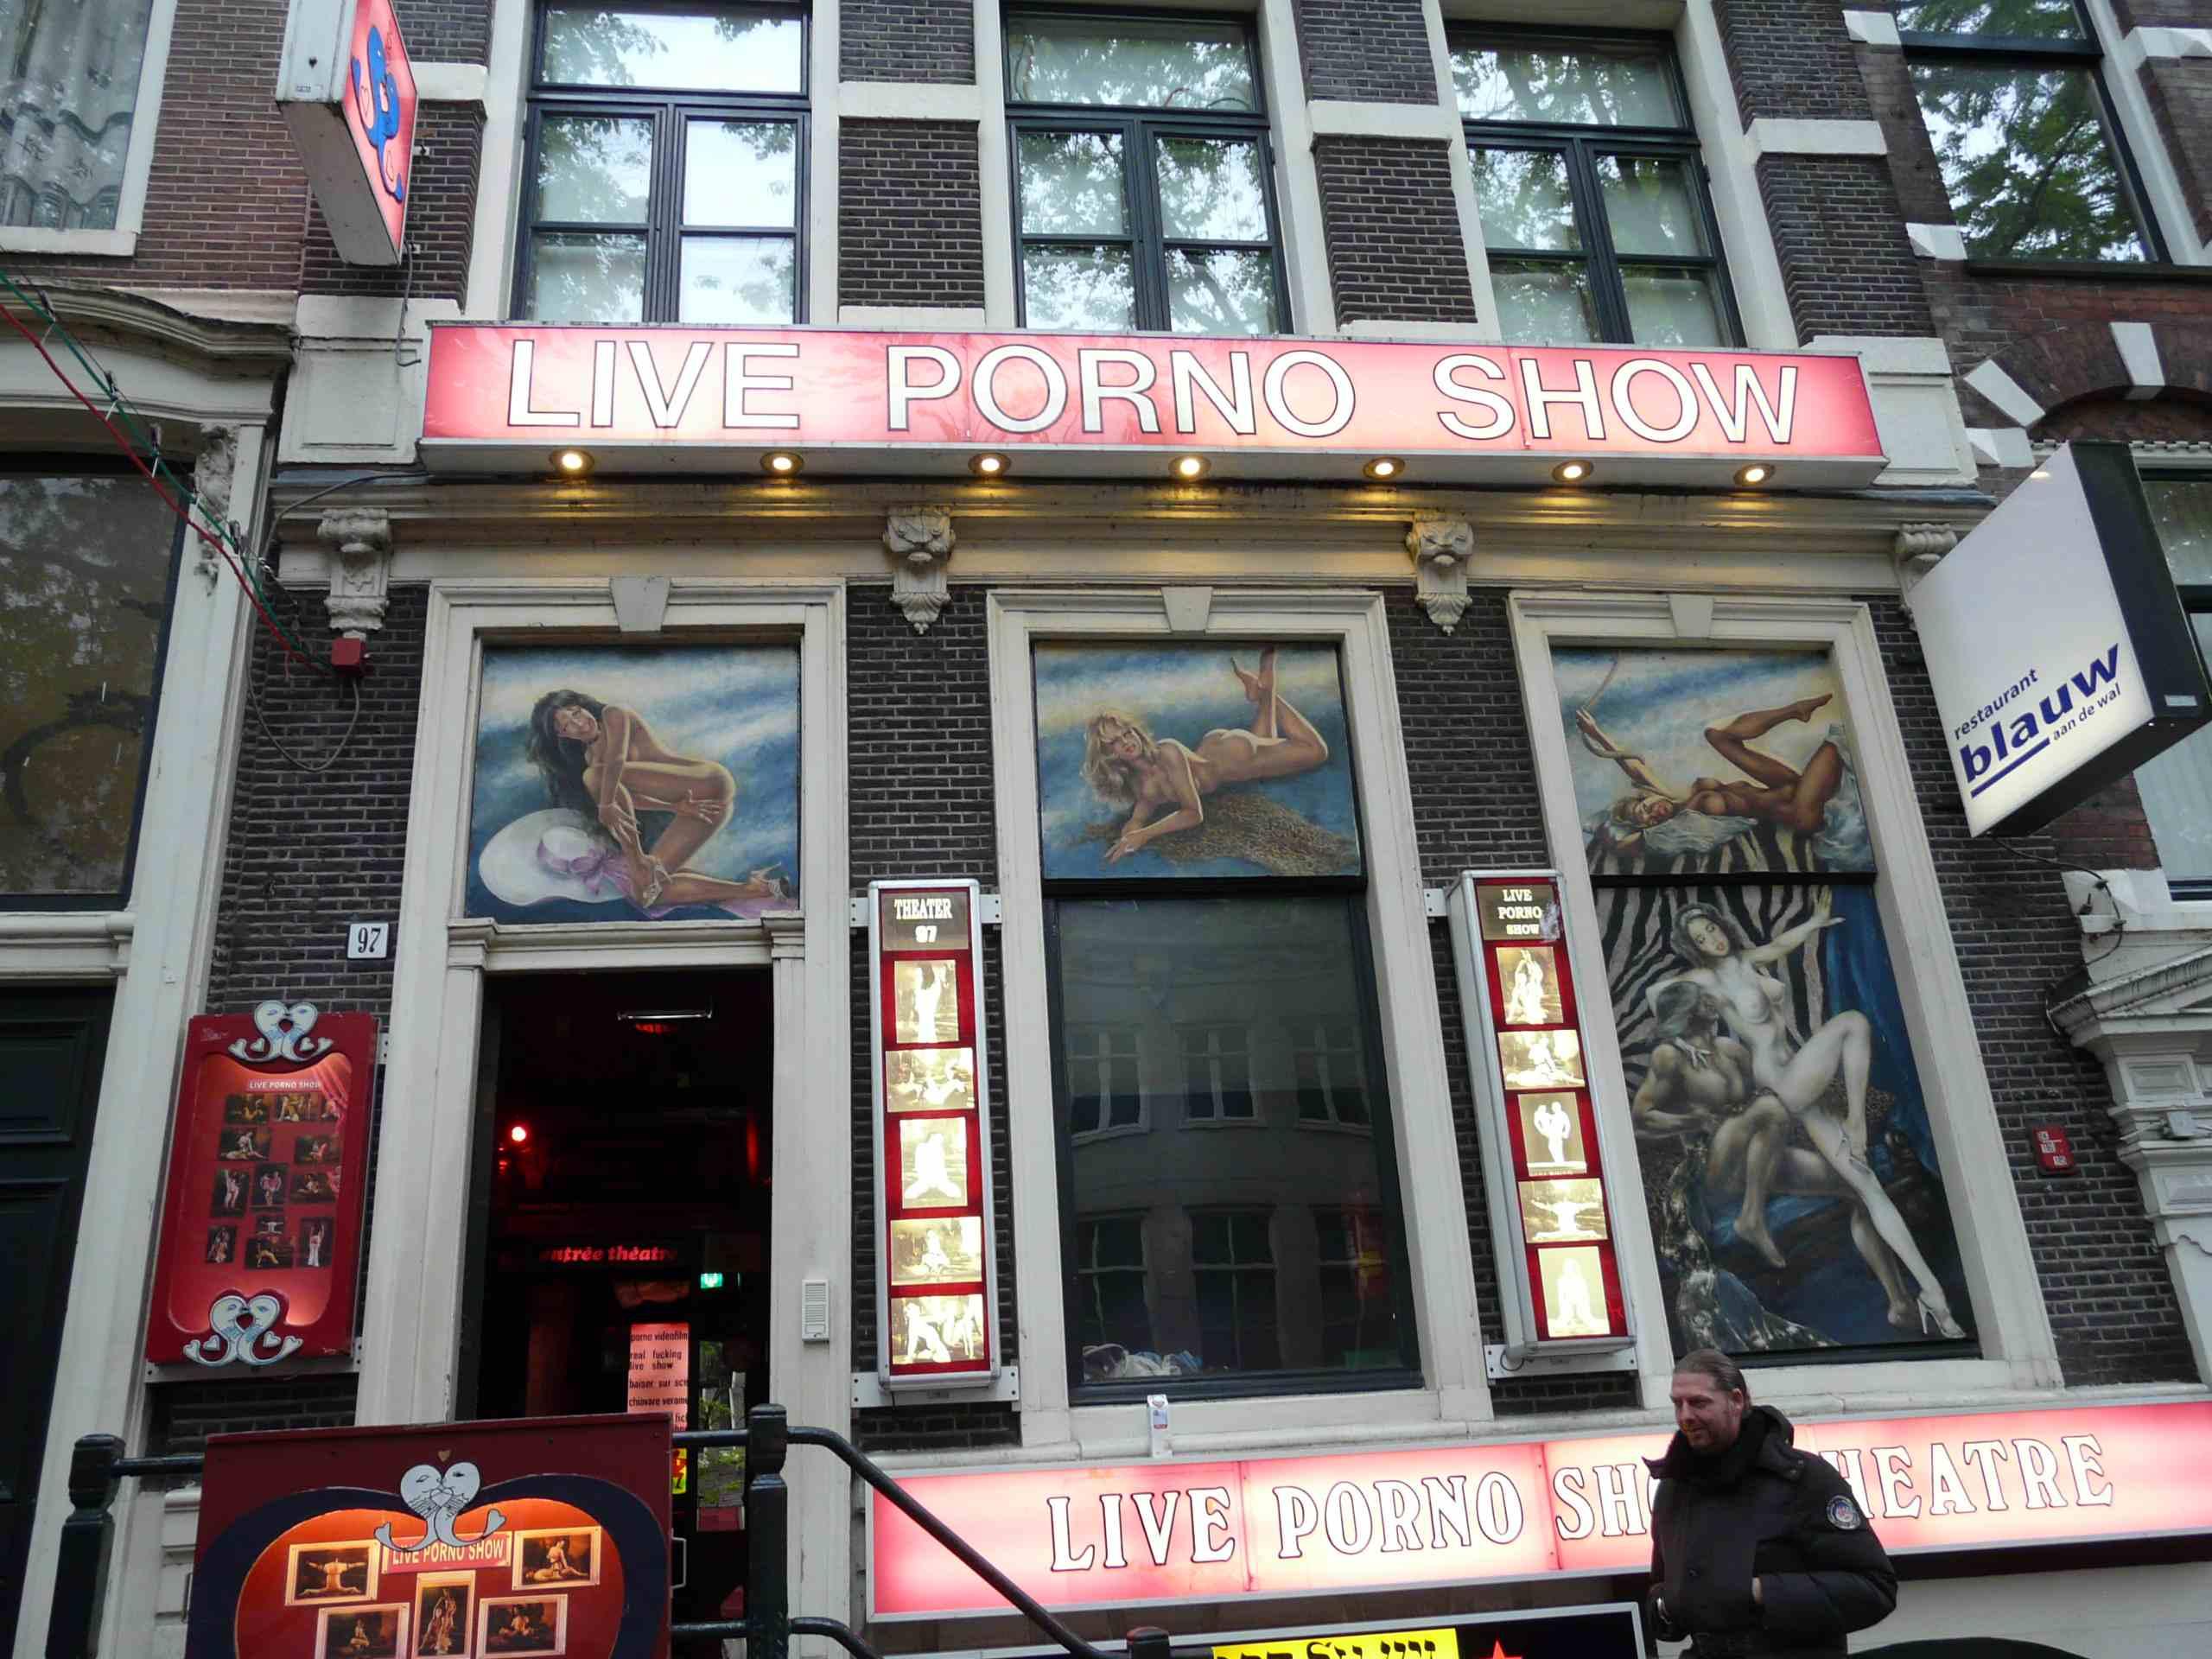 Перейти в галерею Секс в Амстердаме музей, улица, театр .